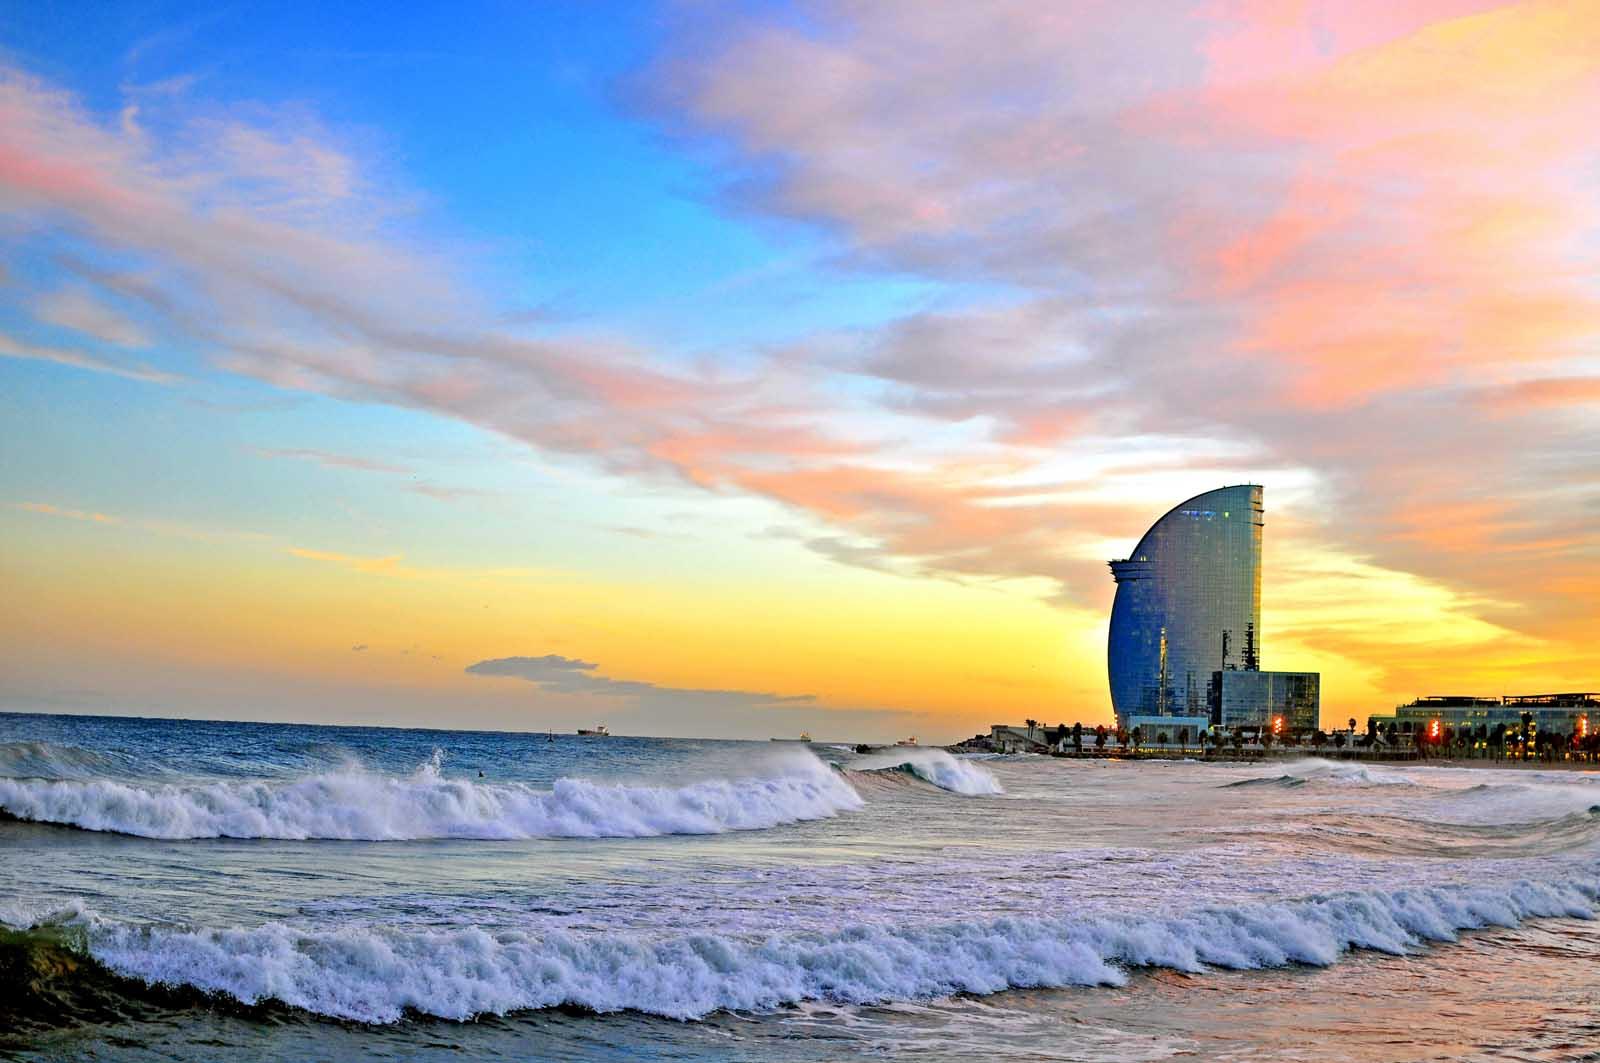 Barcelona Beach at sunset